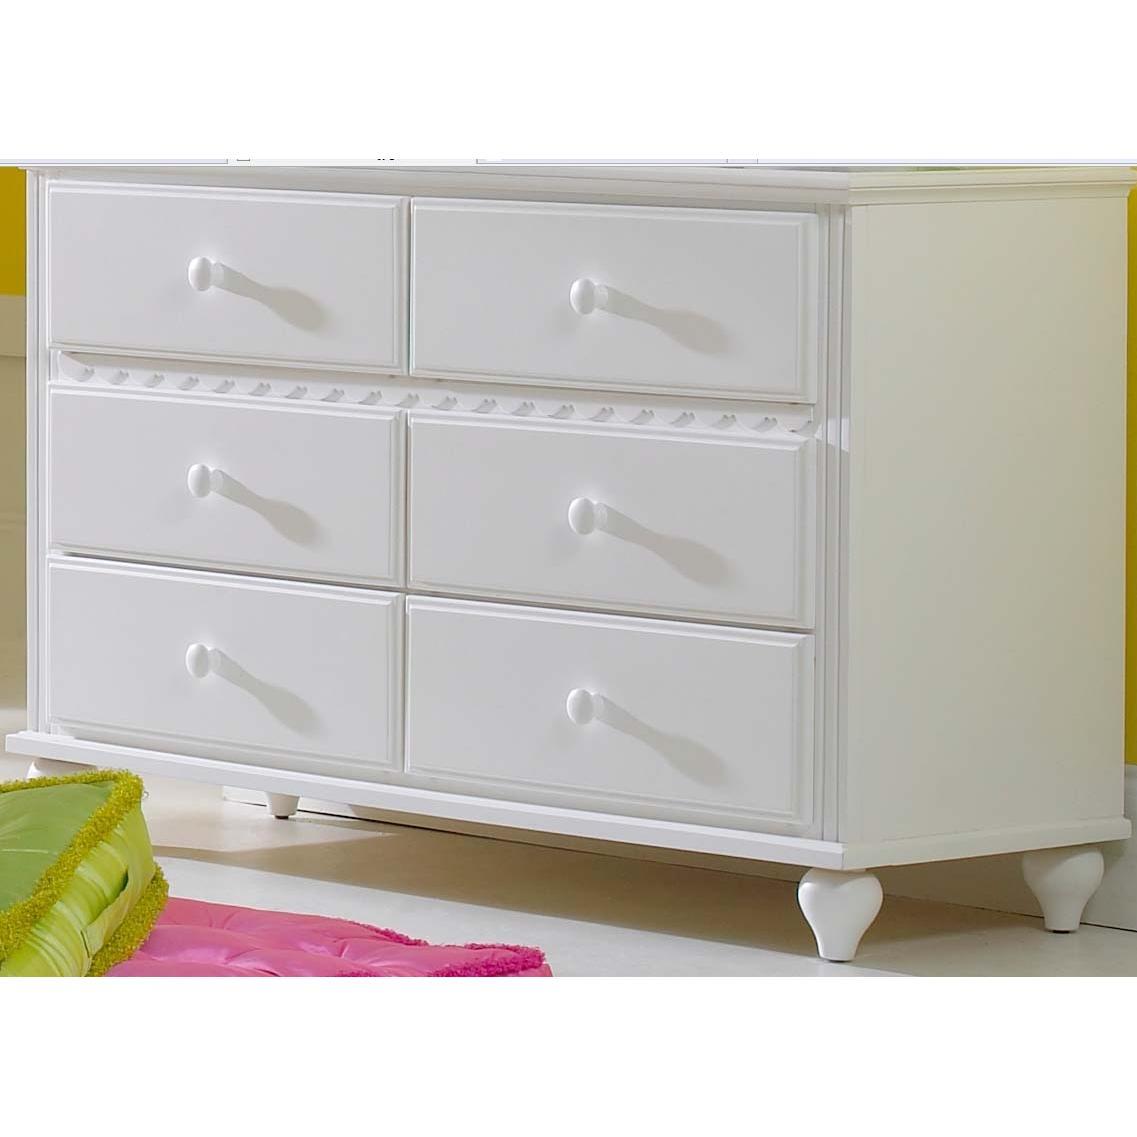 Picture of Hillsdale White Lauren Bedroom Dresser - 1528-717W